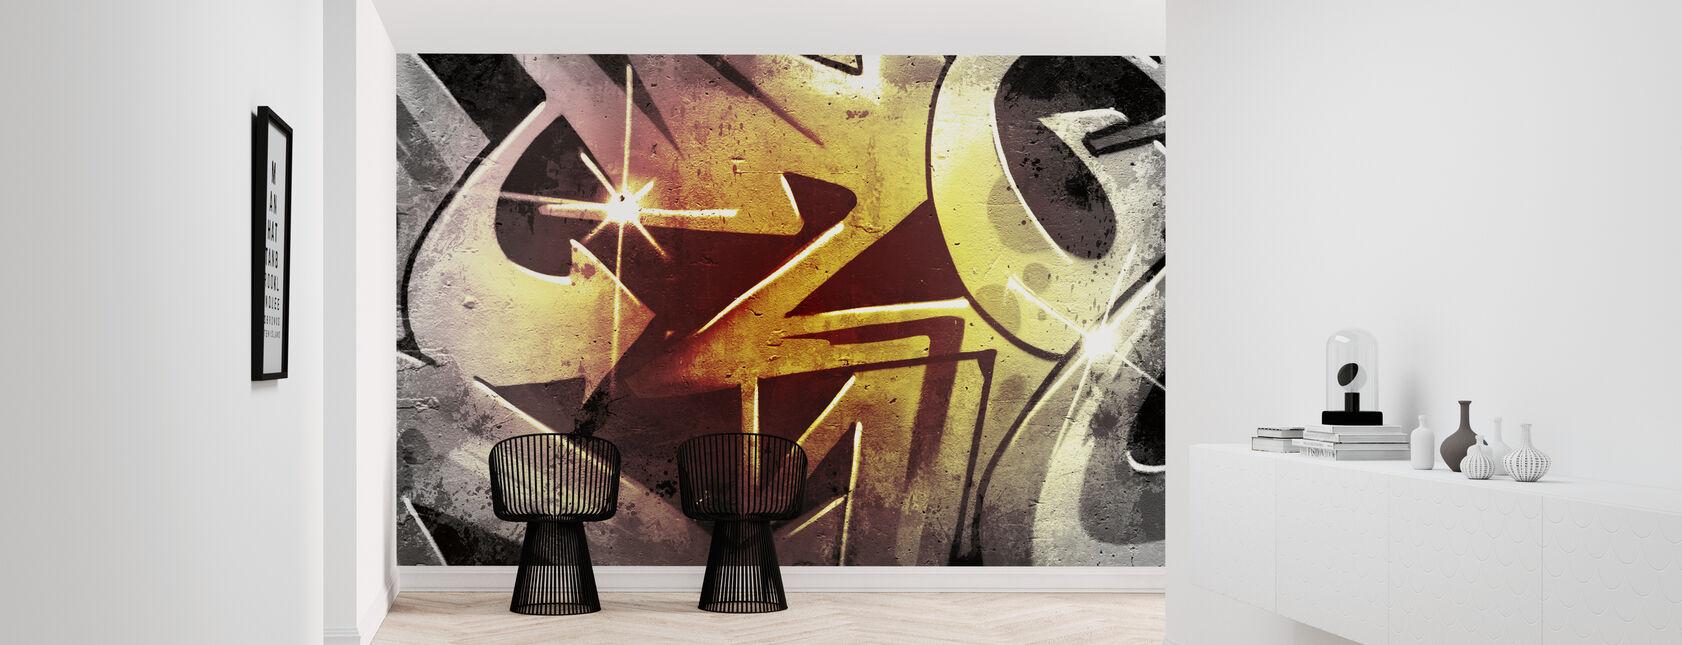 Graffiti over gamle beskidte mur - Tapet - Entré